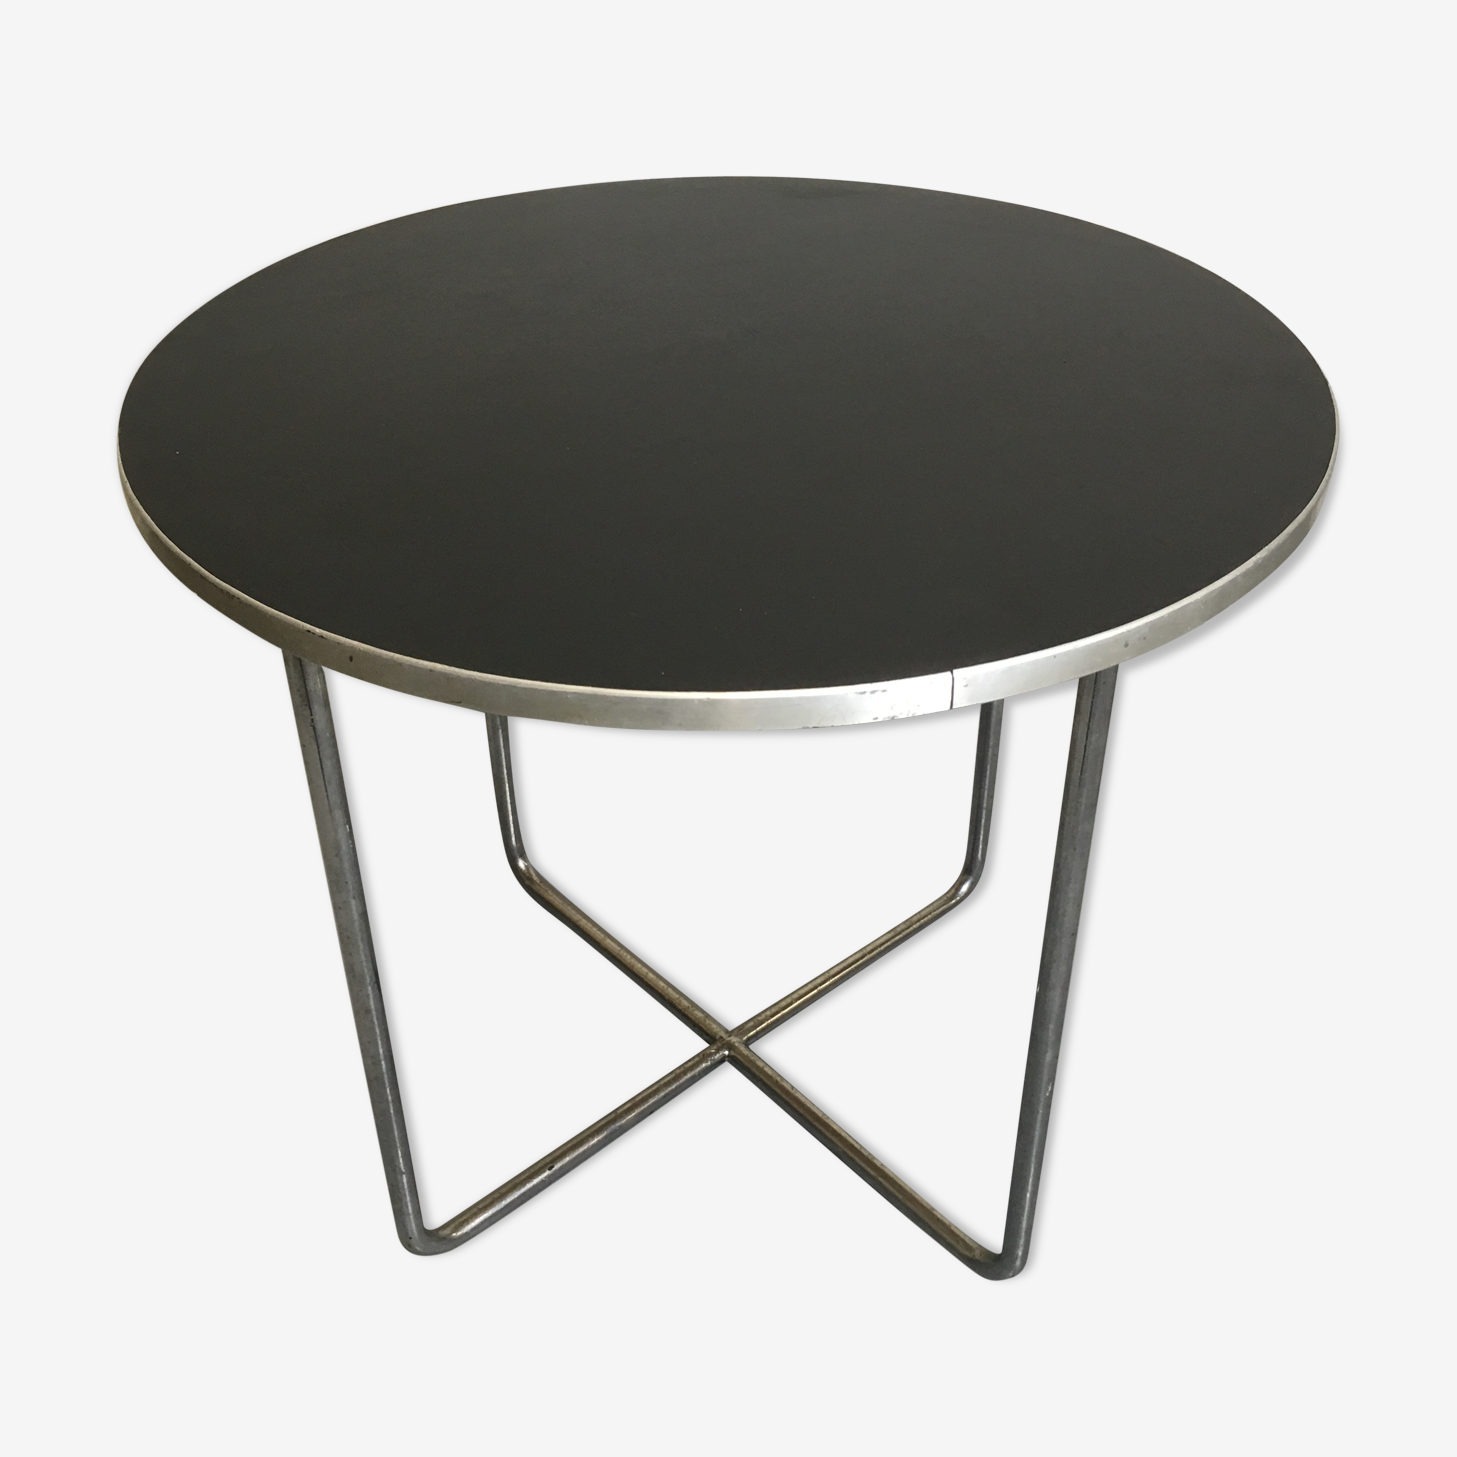 Gispen 501 dining table